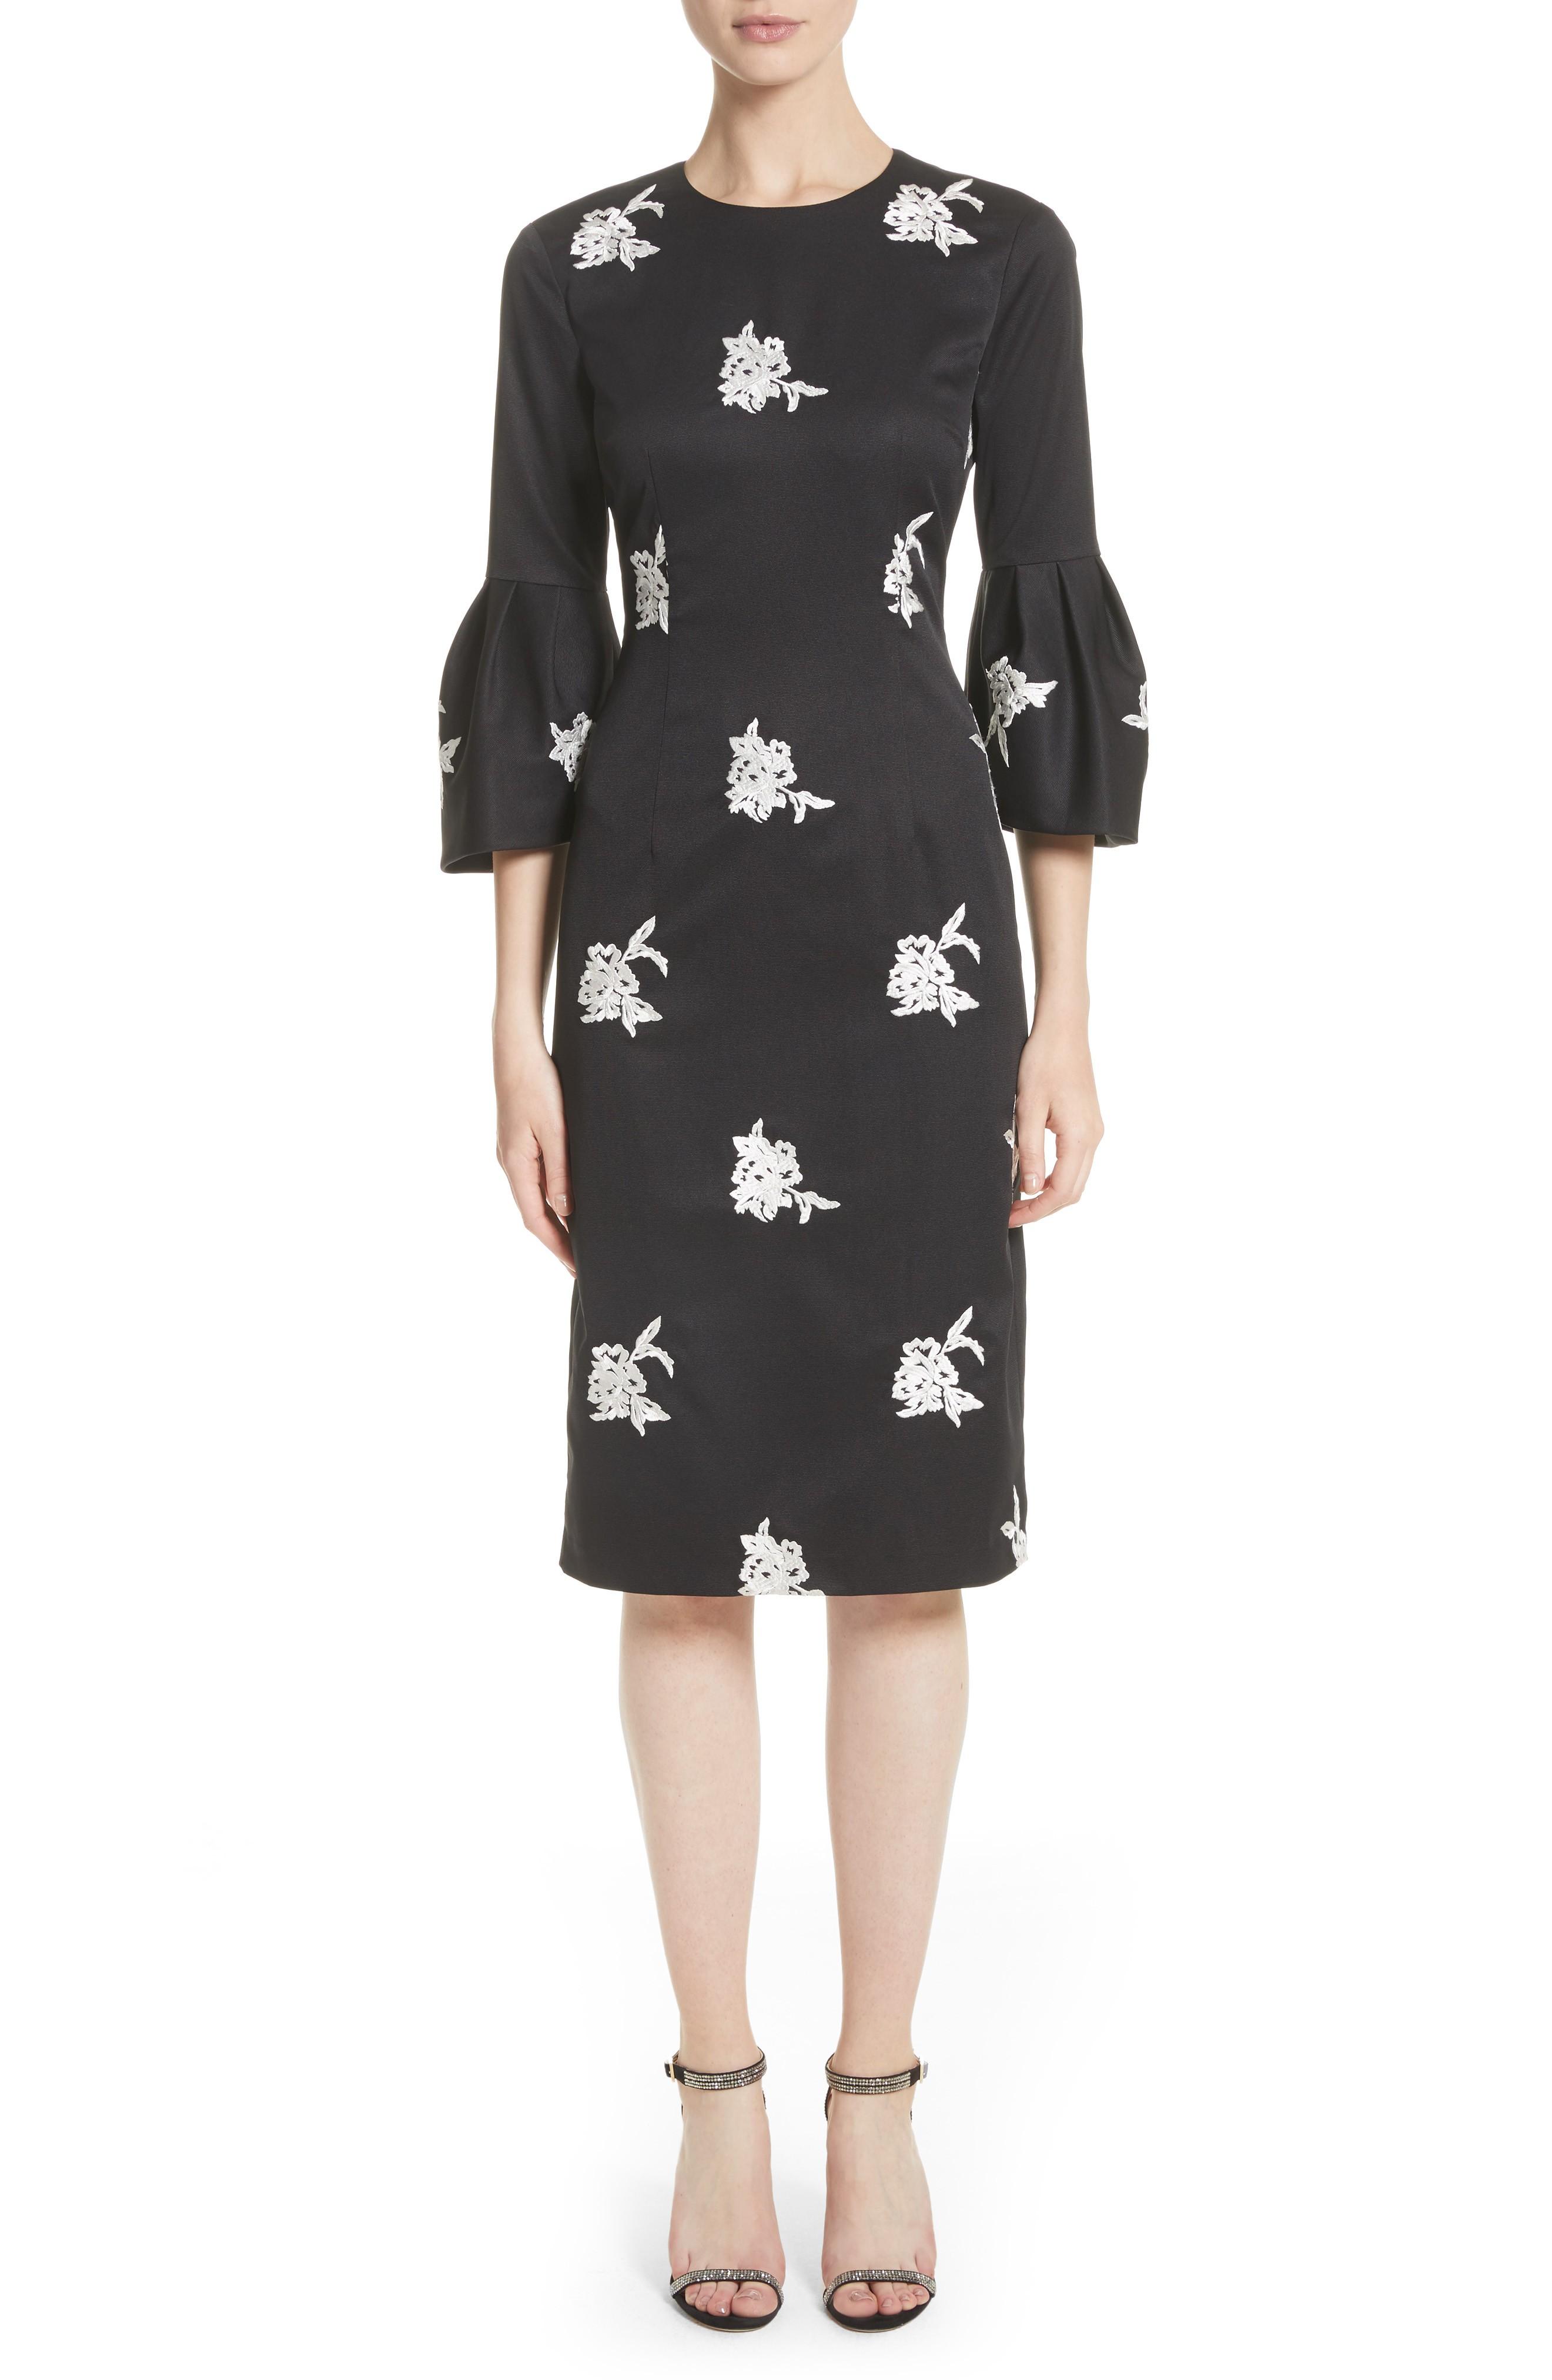 SACHIN & BABI NOIR Embroidered Bell Sleeve Sheath Black Dress